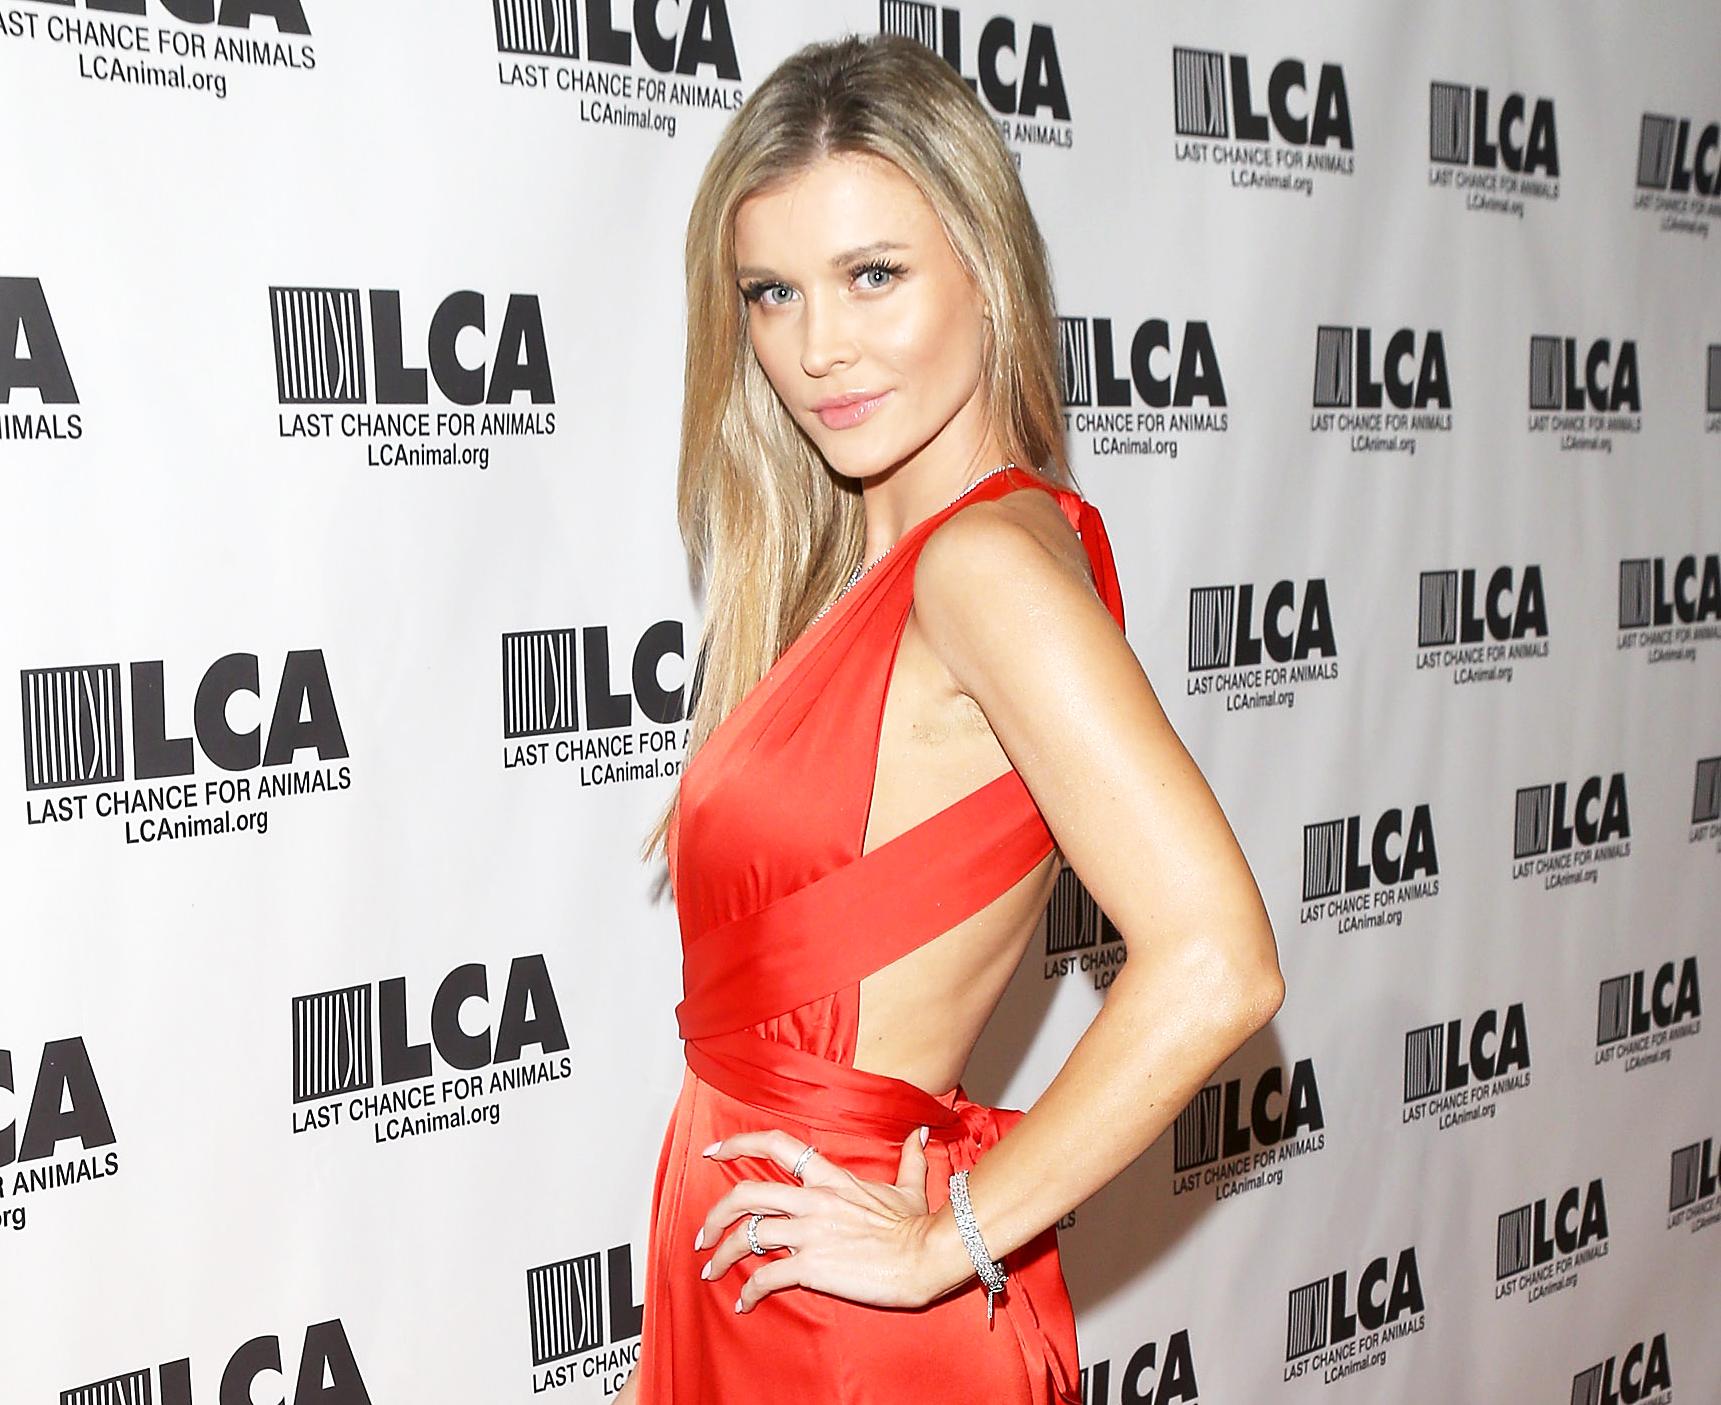 Joanna Krupa Engaged To Douglas Nunes; Is She Pregnant Too?